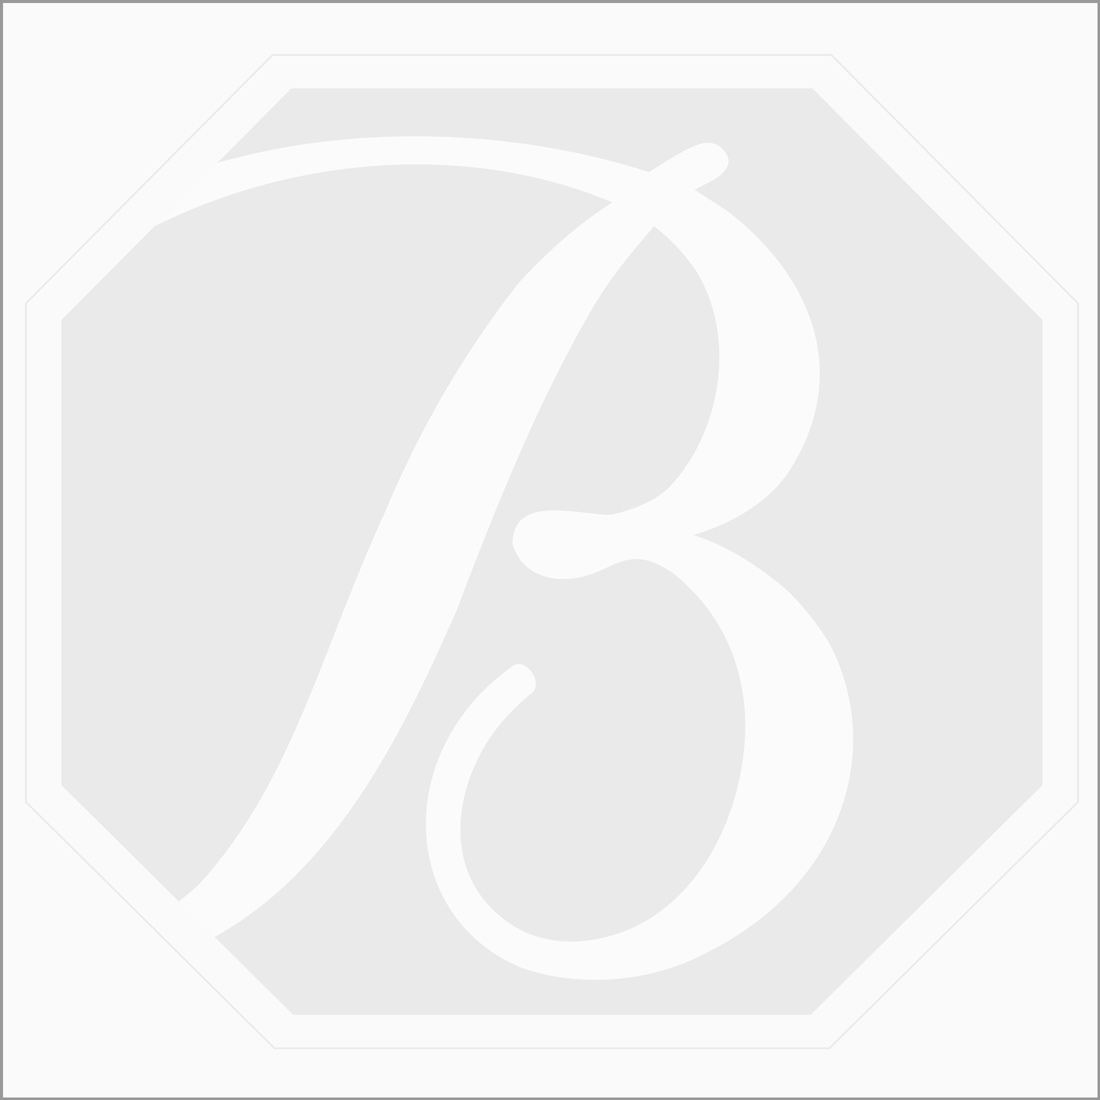 5 Pcs - 24.87 ct. -Medium Blue Aquamarine Oval Cabochon - 11 x 9.1 x 5.9 mm to 12.5 x 10.4 x 6 mm (AQCAB1027)